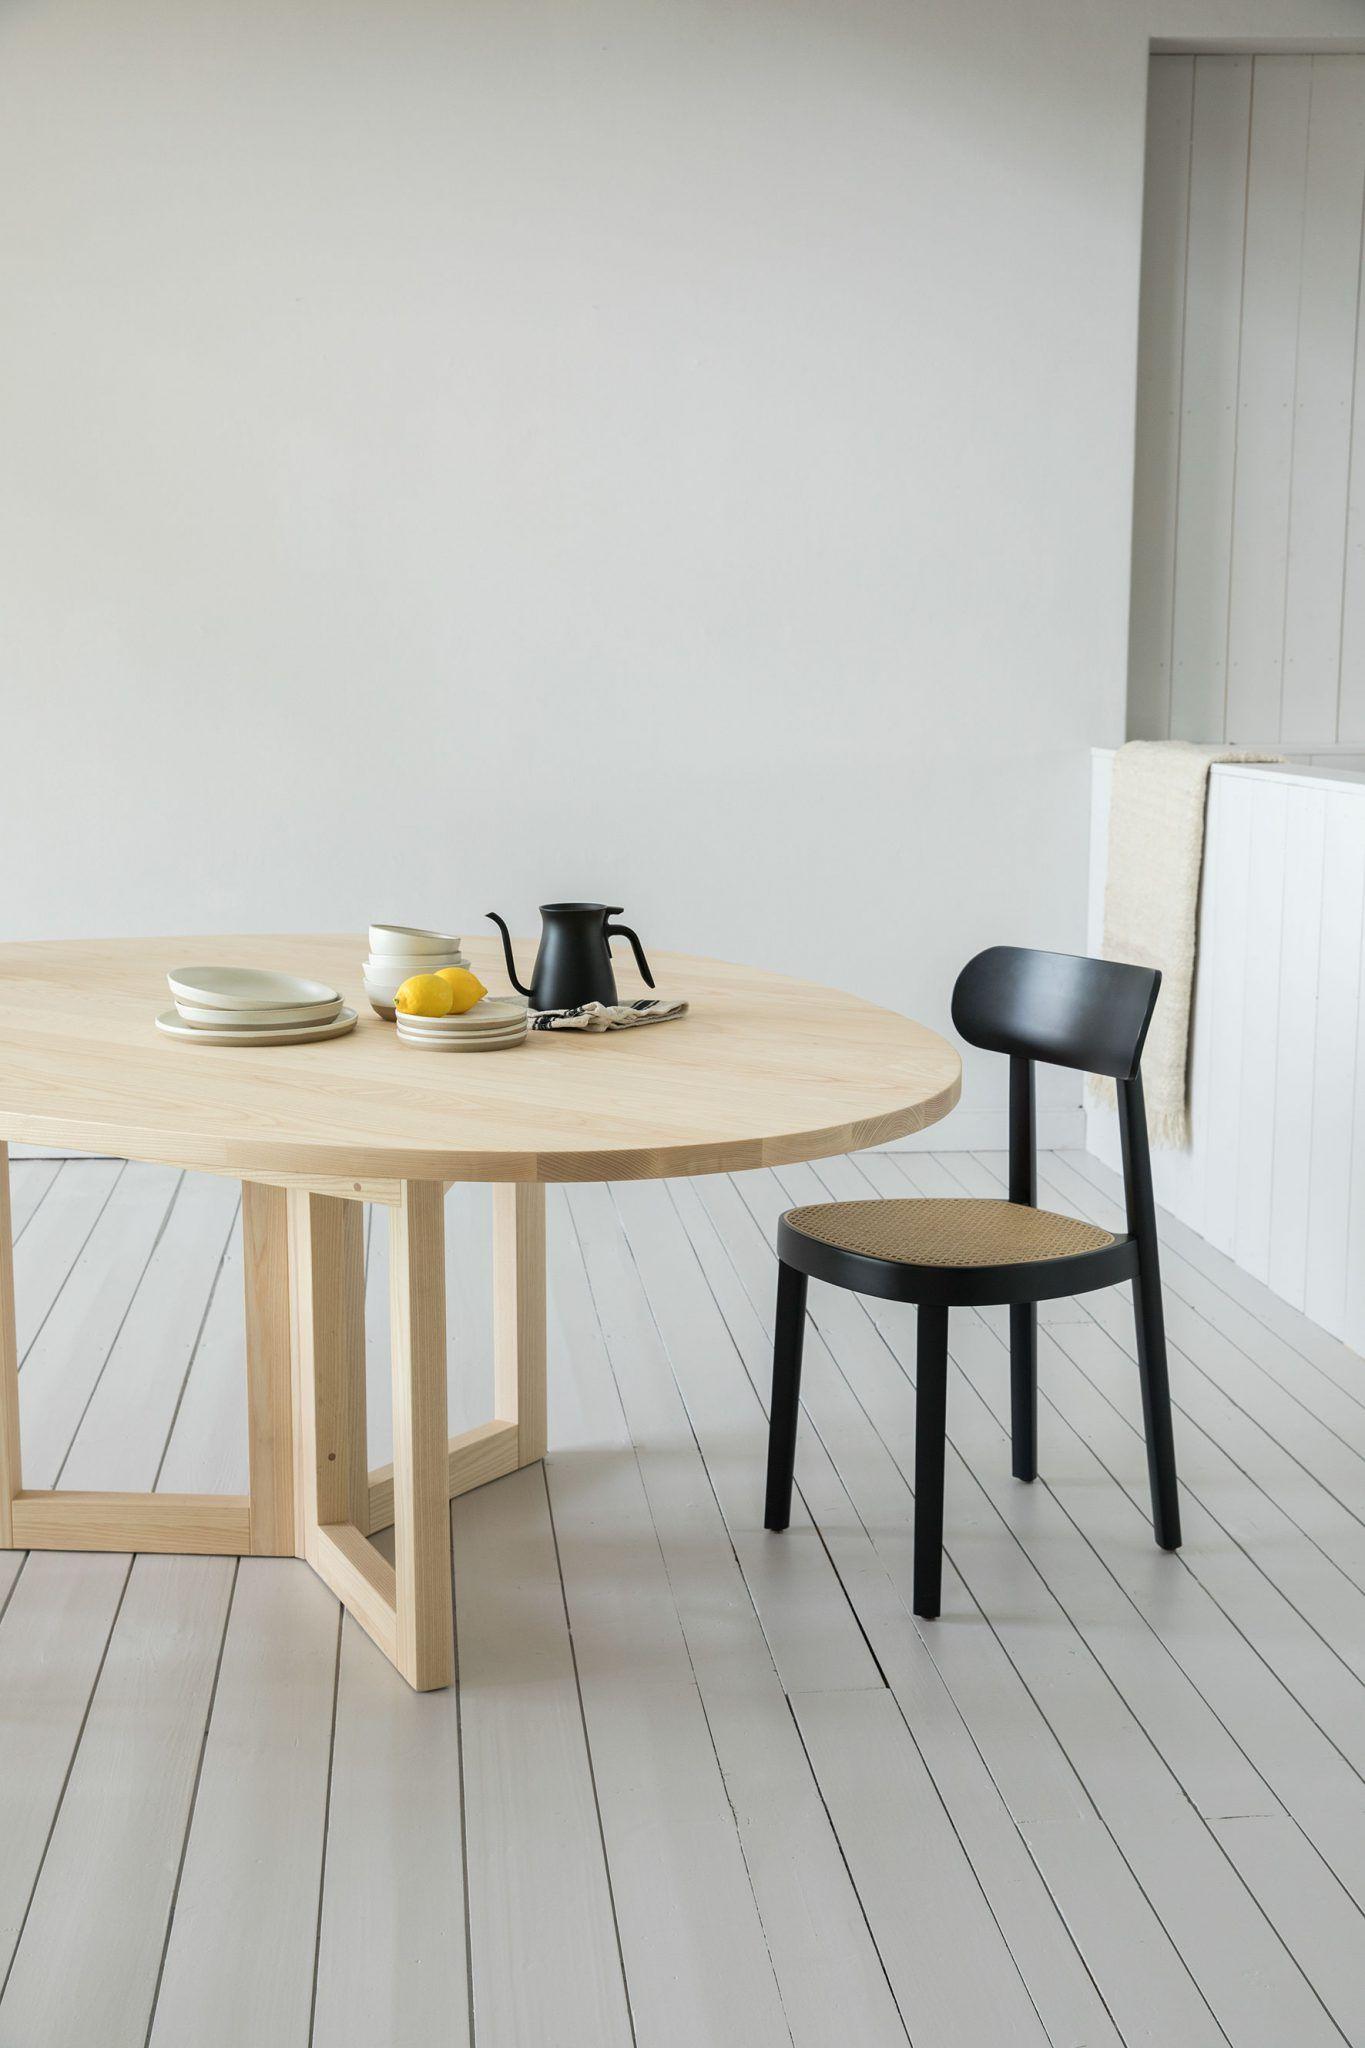 Grut 5 Fiif Slowwood Coffee Table Wood Colors Types Of Wood [ 2048 x 1365 Pixel ]